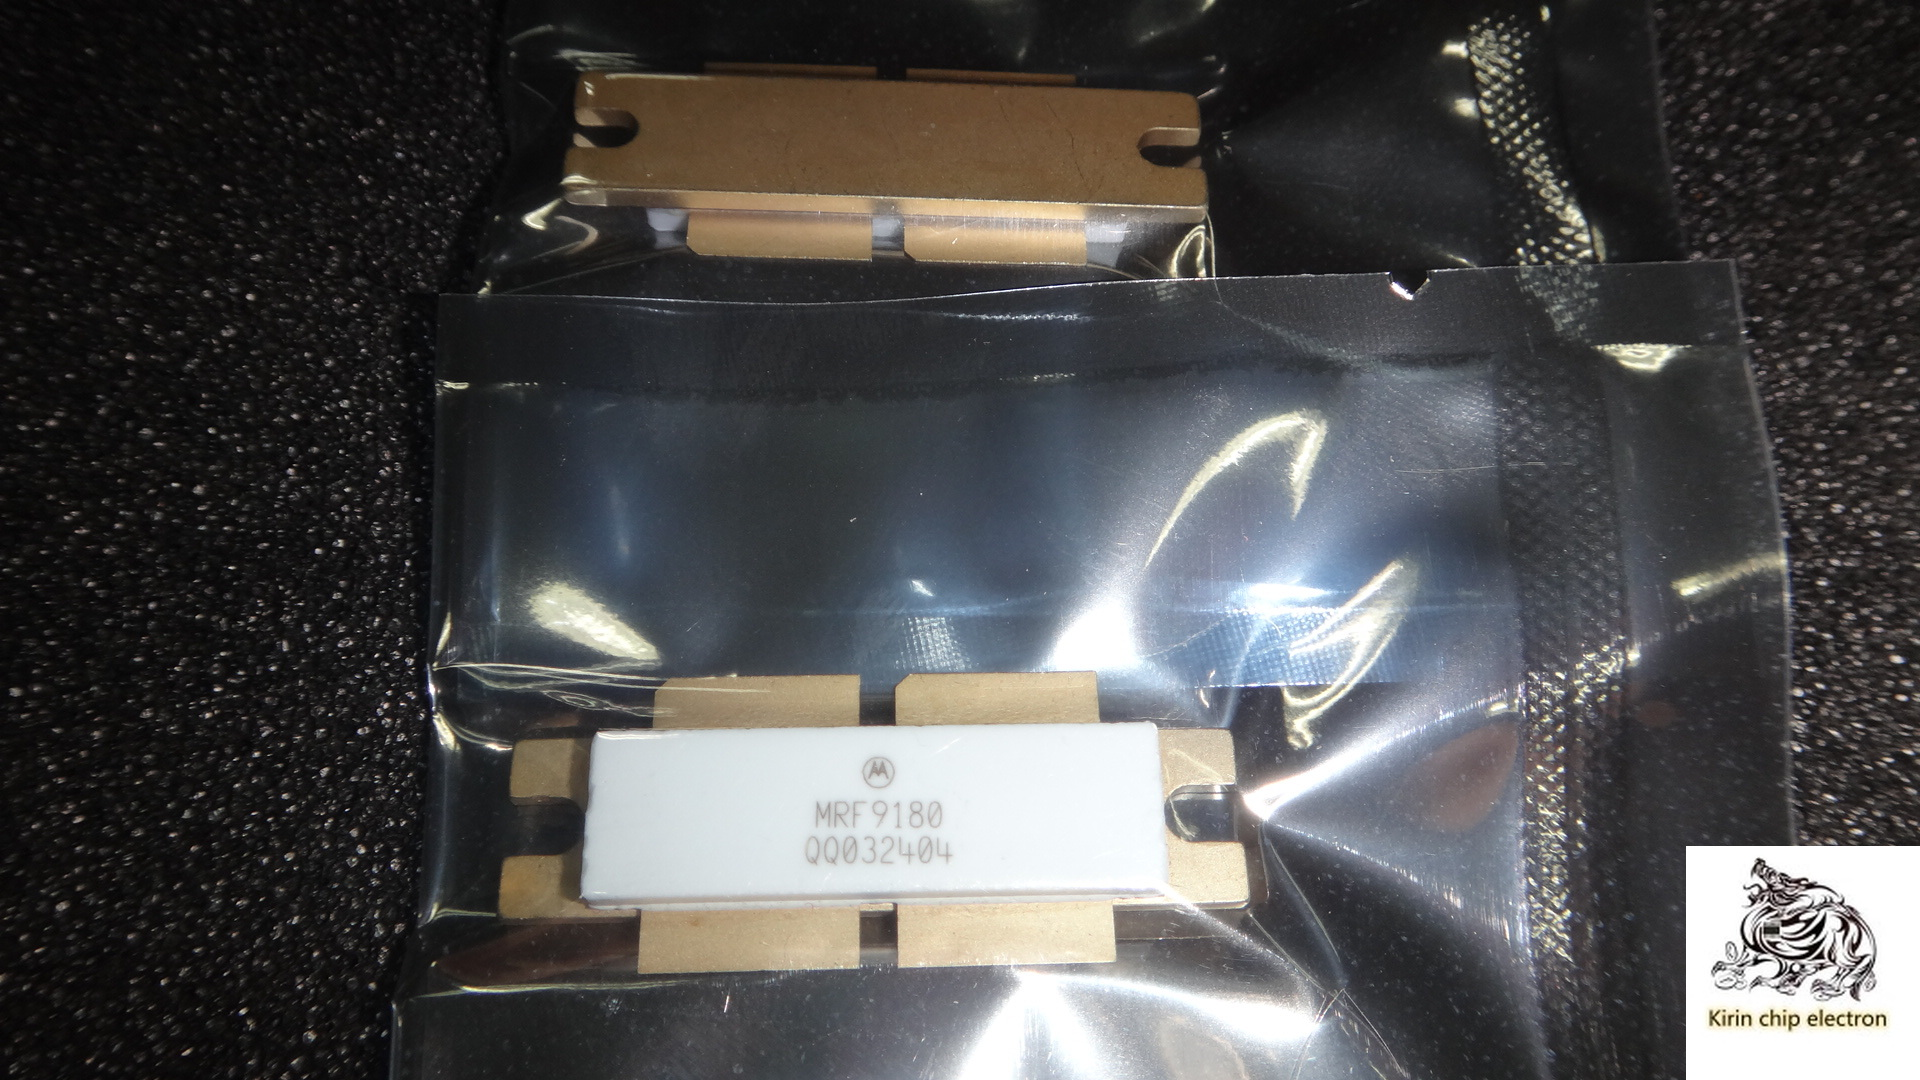 1pcs / Lot Mrf9180 RF Tube Mrf9180s RF Quality Assurance Of Exclusive RF Tube Microwave Tube